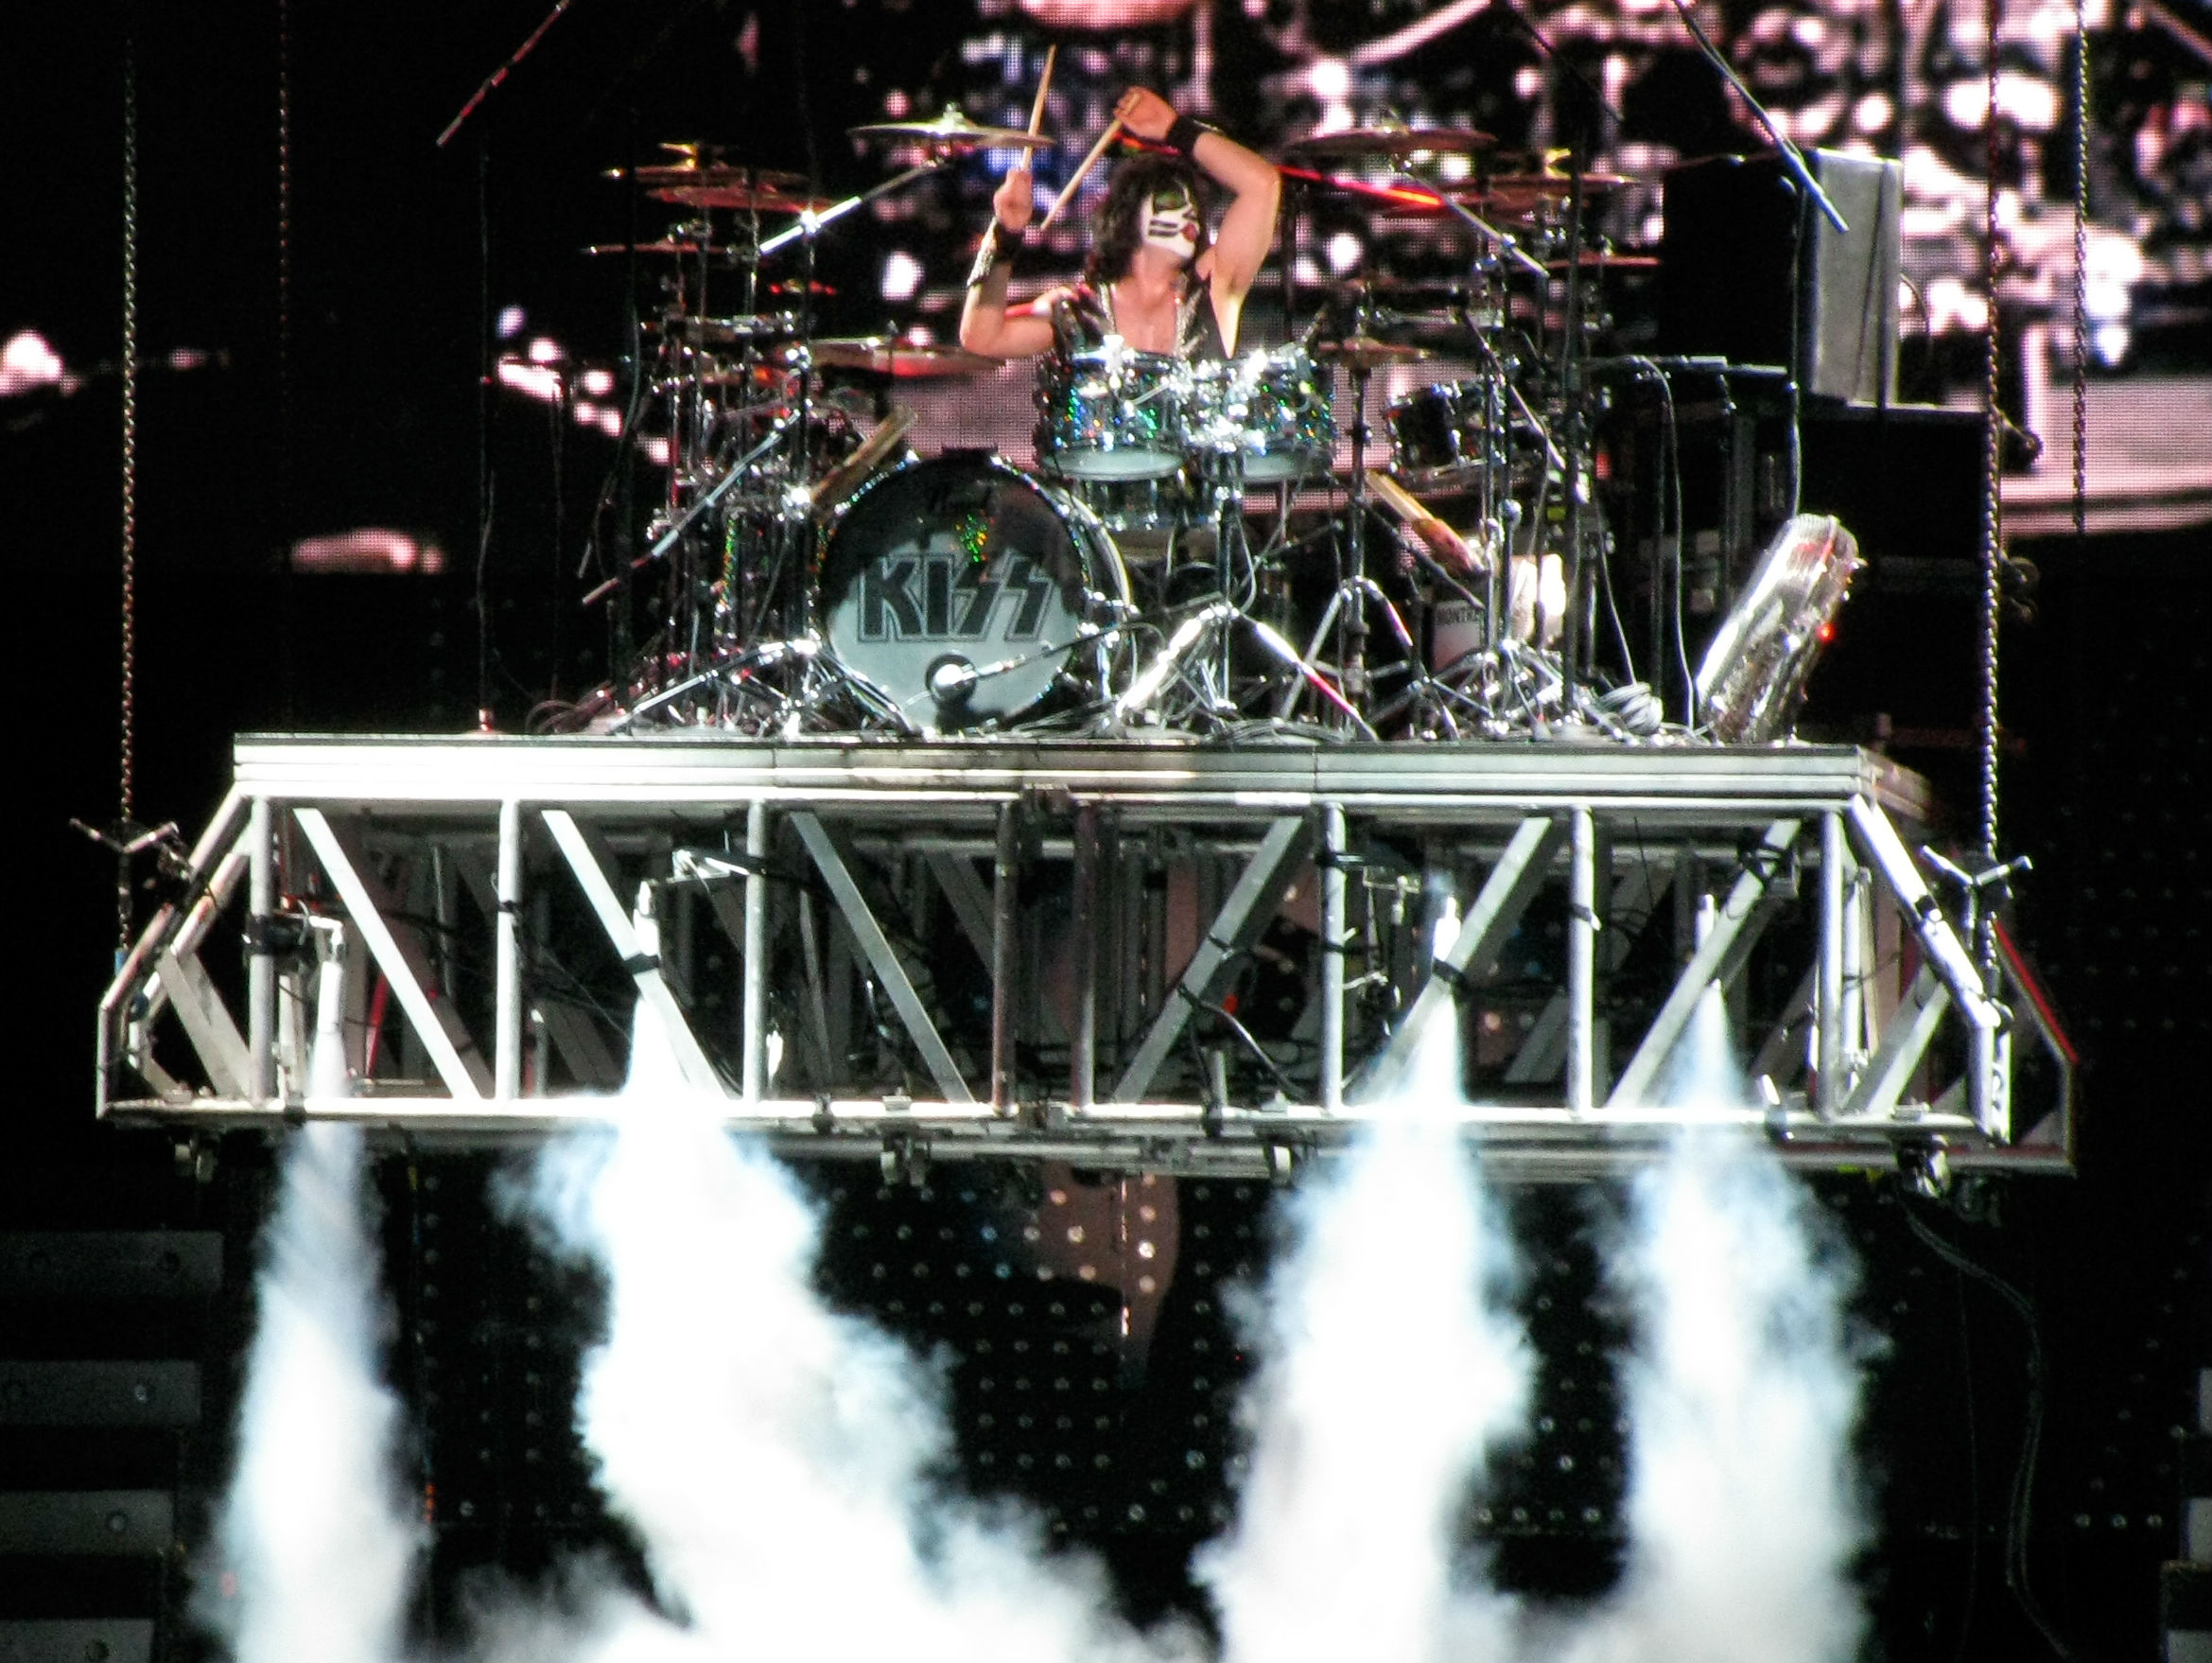 Kiss heavy metal rock bands drums concert wallpaper background 2339x1758